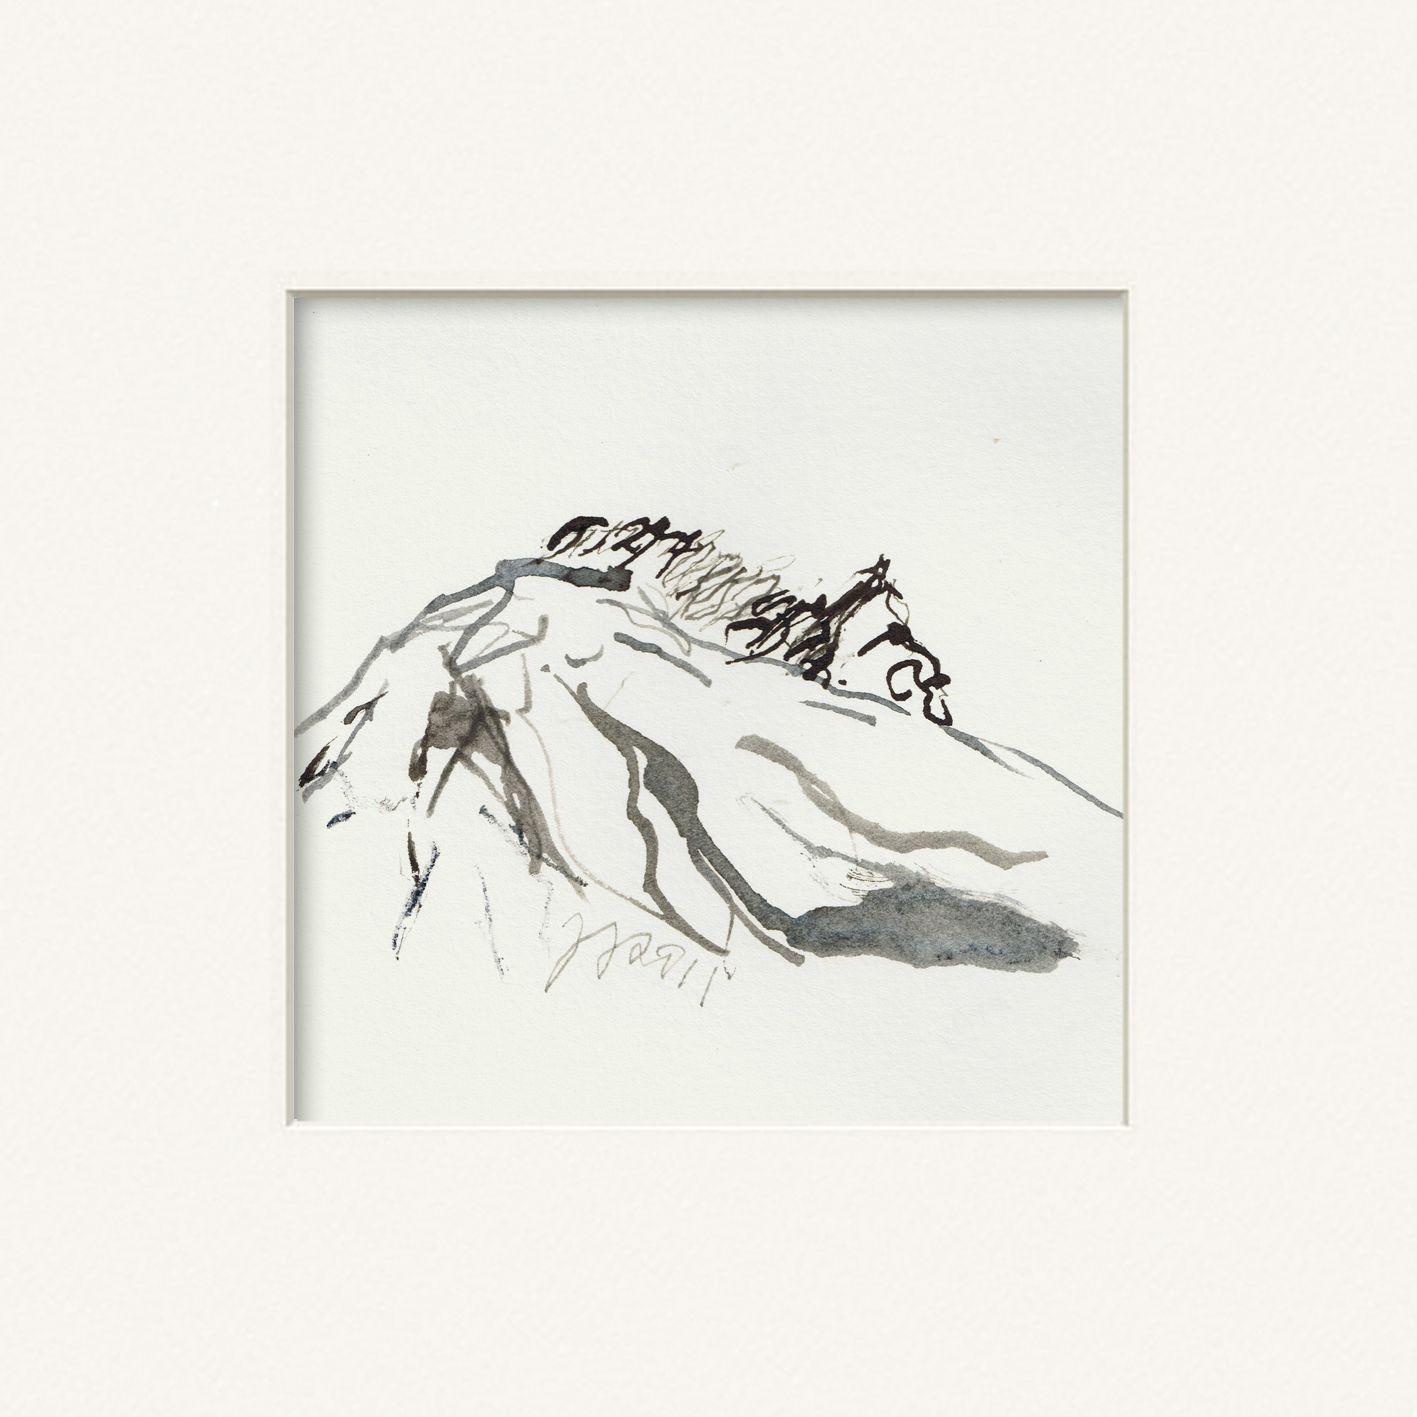 x201108201314Obere Wildgruben-Spitze